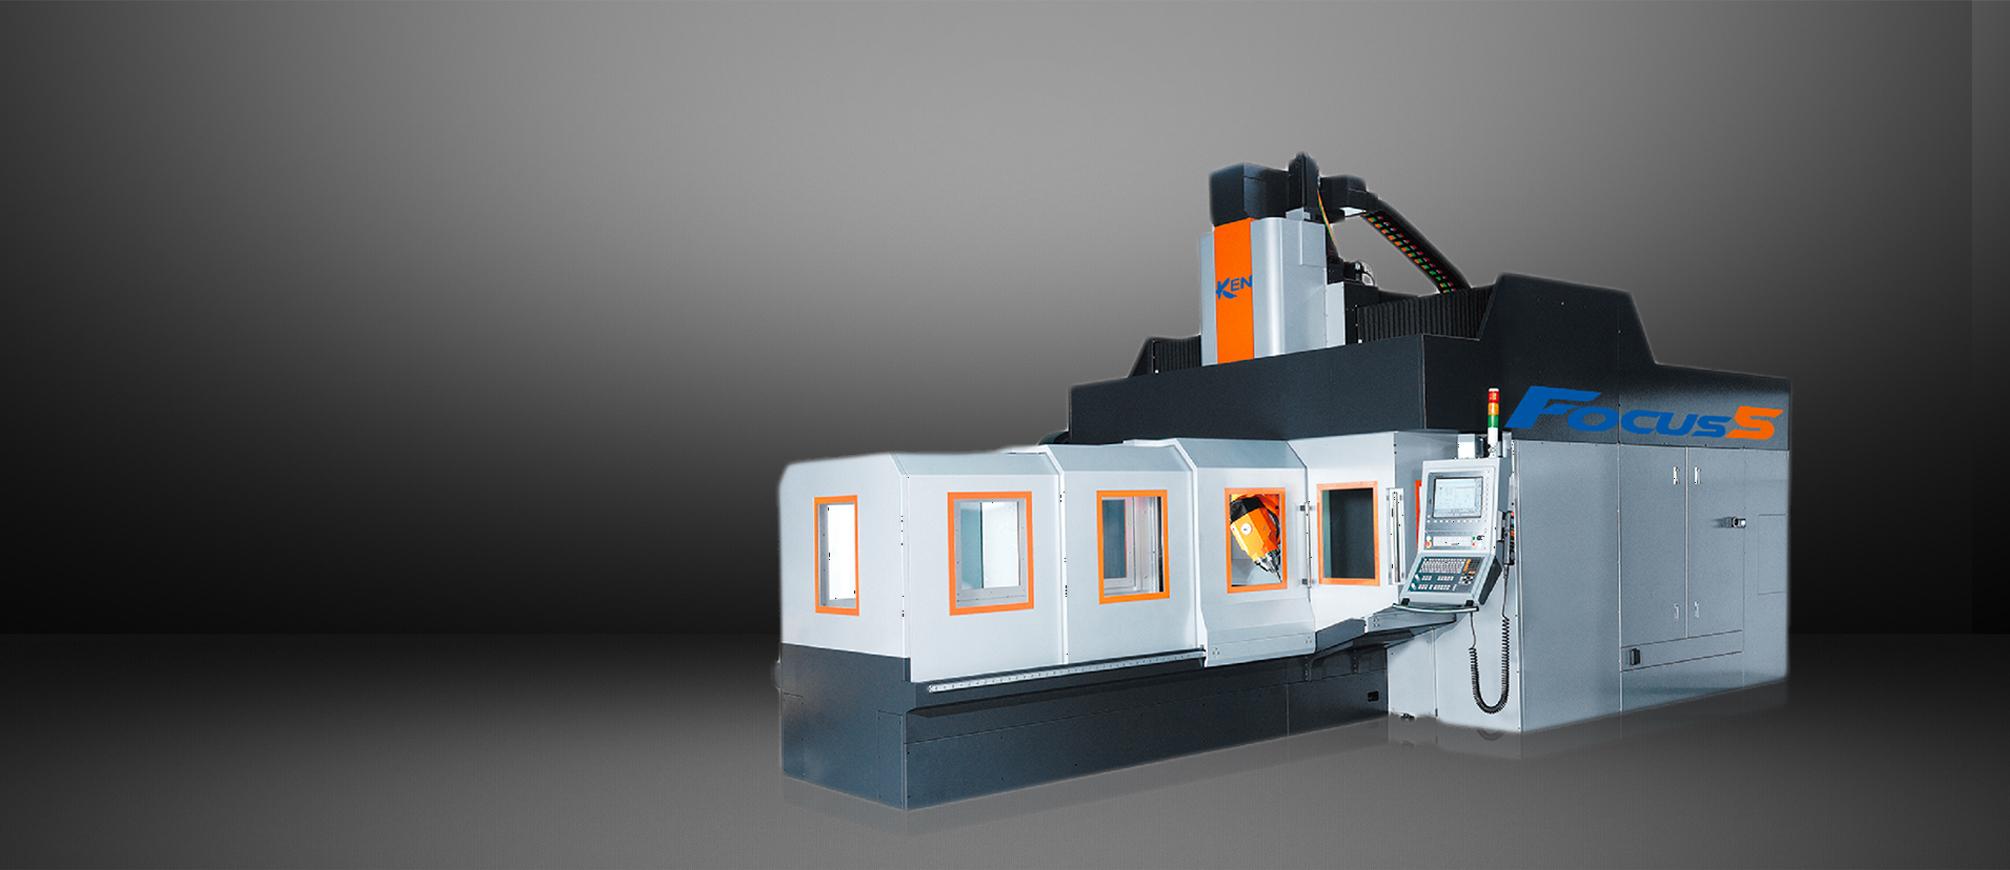 FOCUS-5 2022 Linear Motor 5 Axis